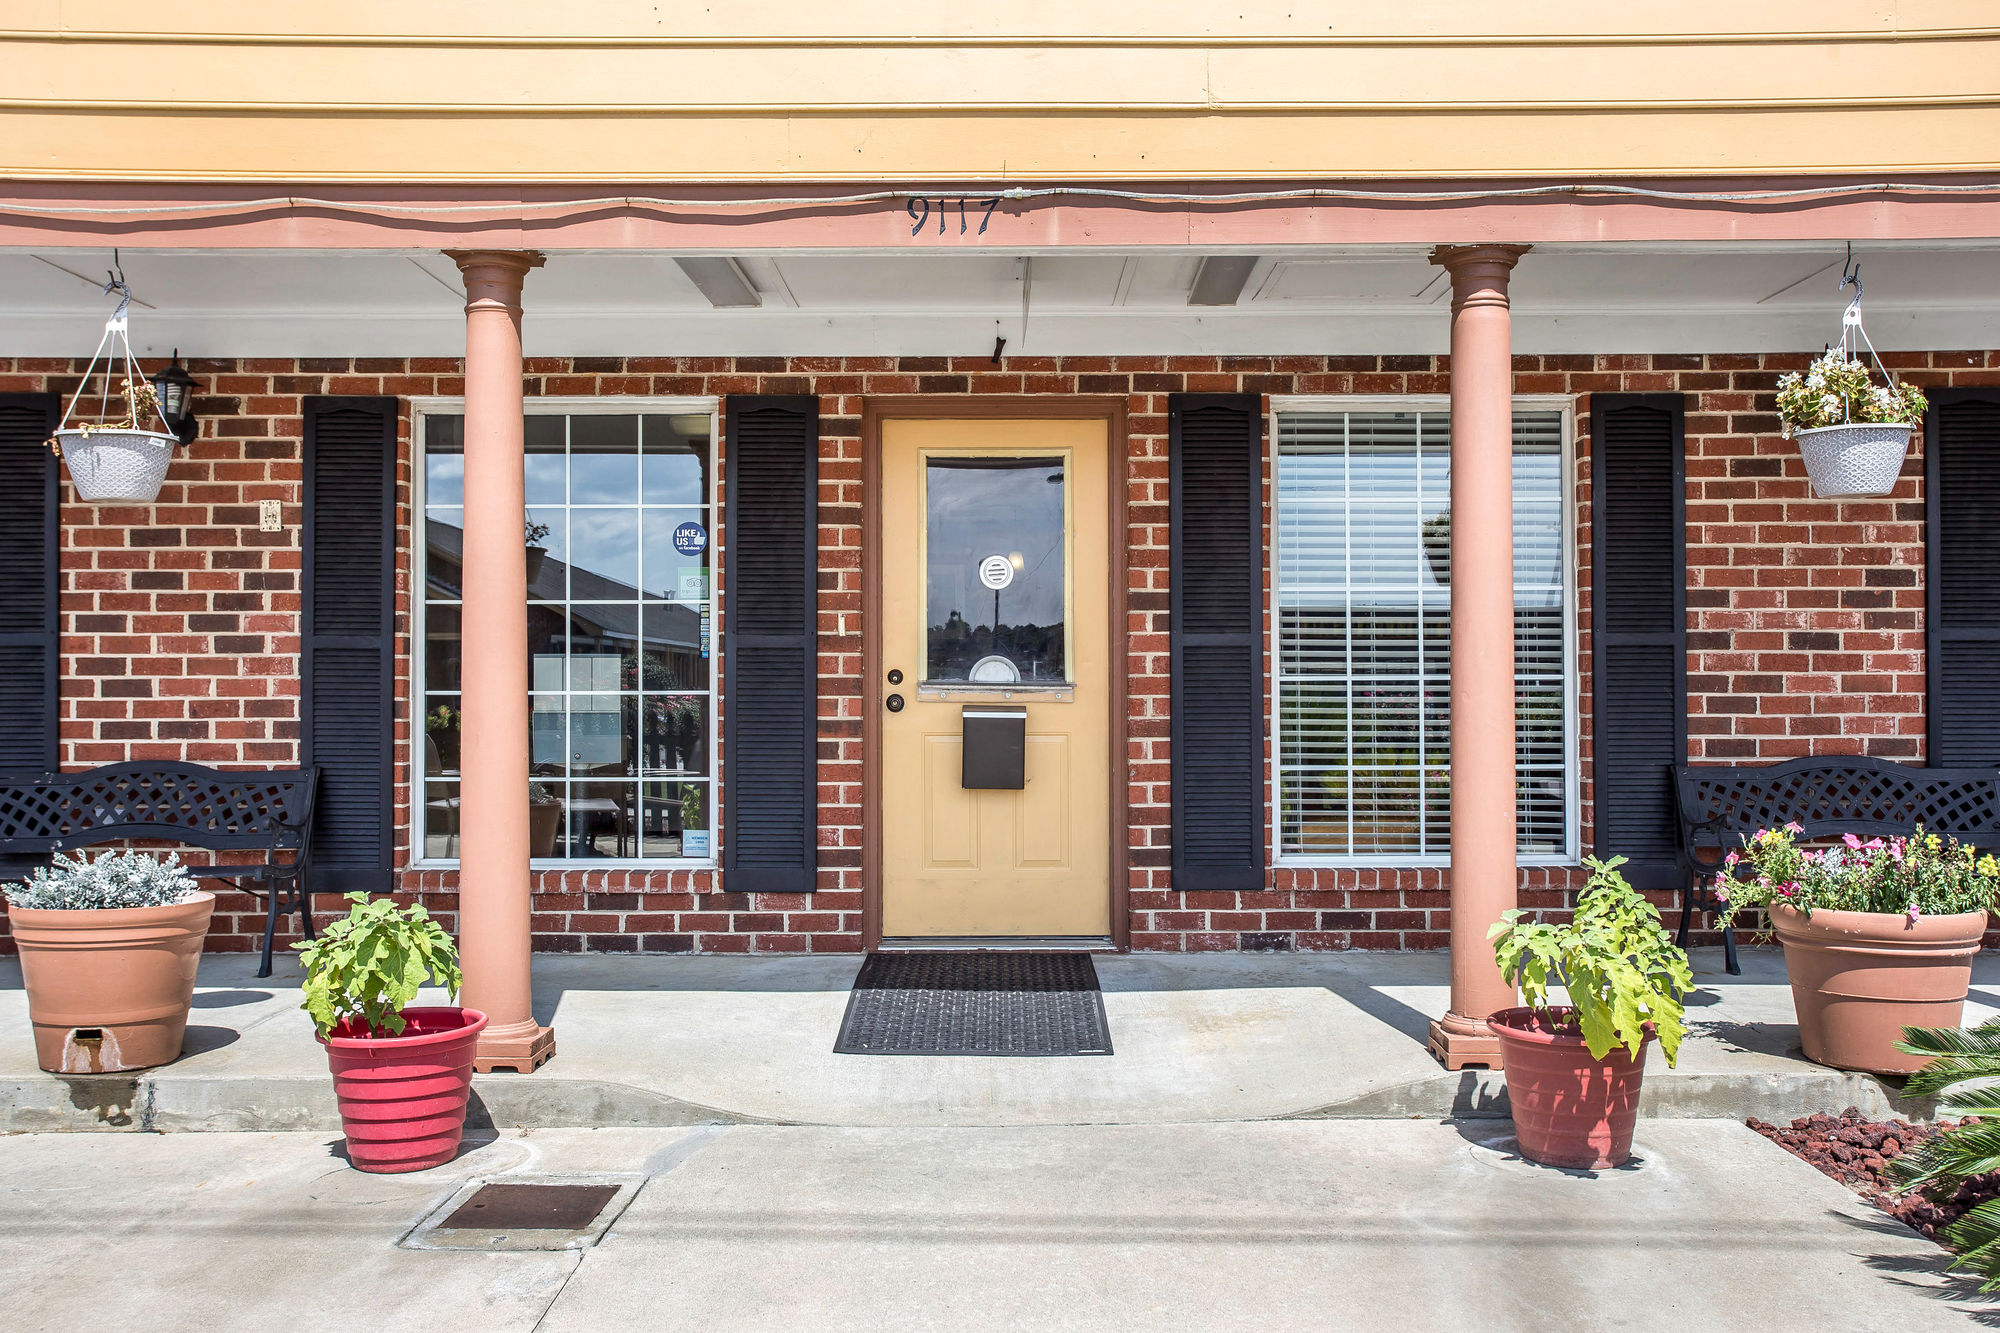 Rodeway Inn in Santee, SC